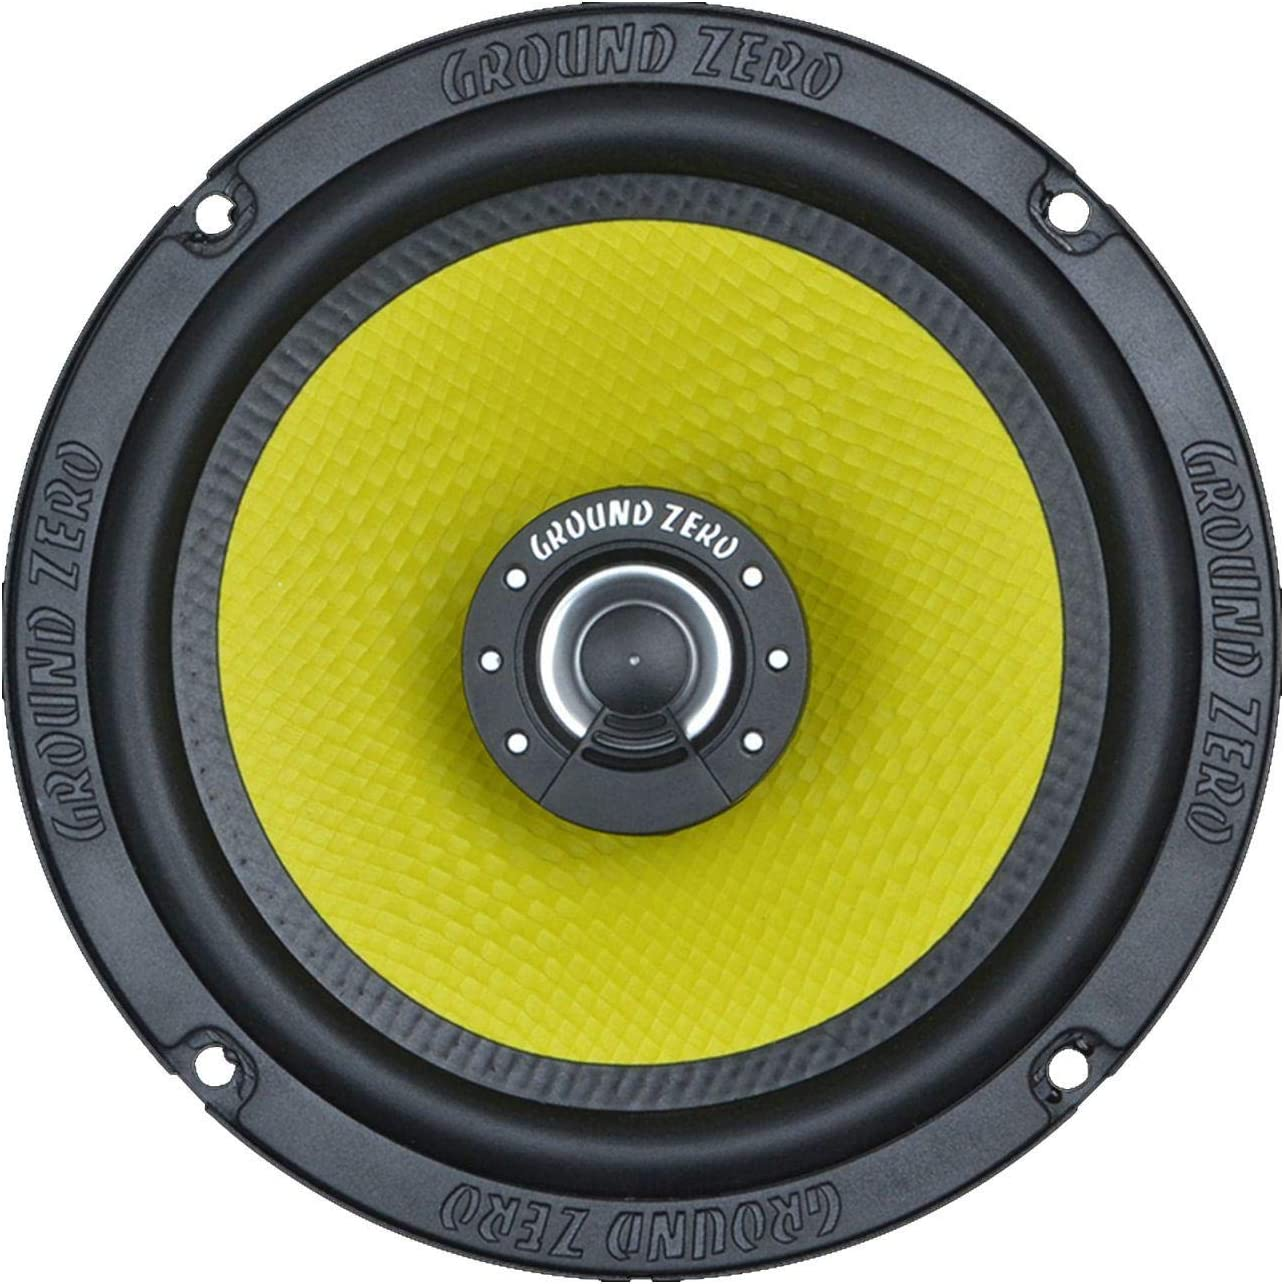 Ground Zero Gztf 16 16 Cm Coaxial Speaker Navigation Car Hifi